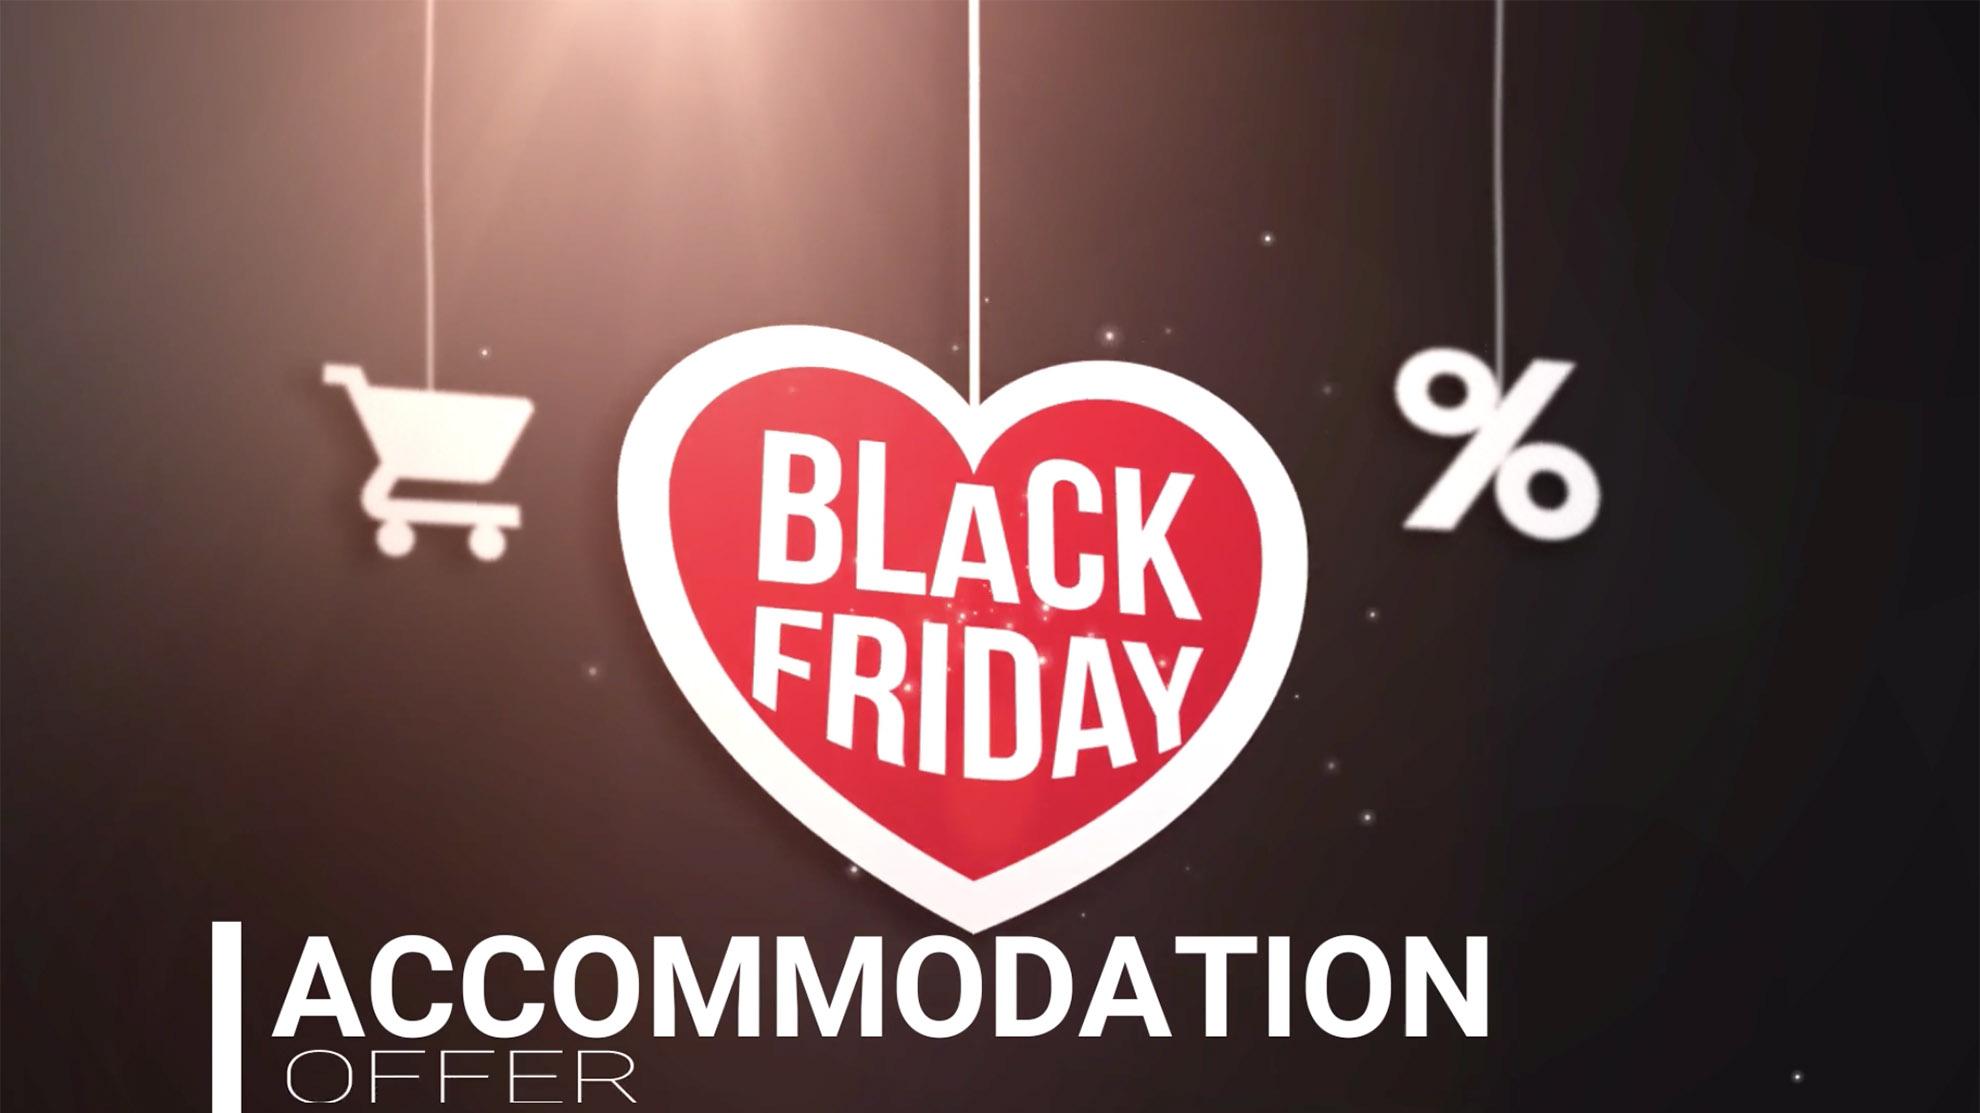 Black Friday accommodation offer